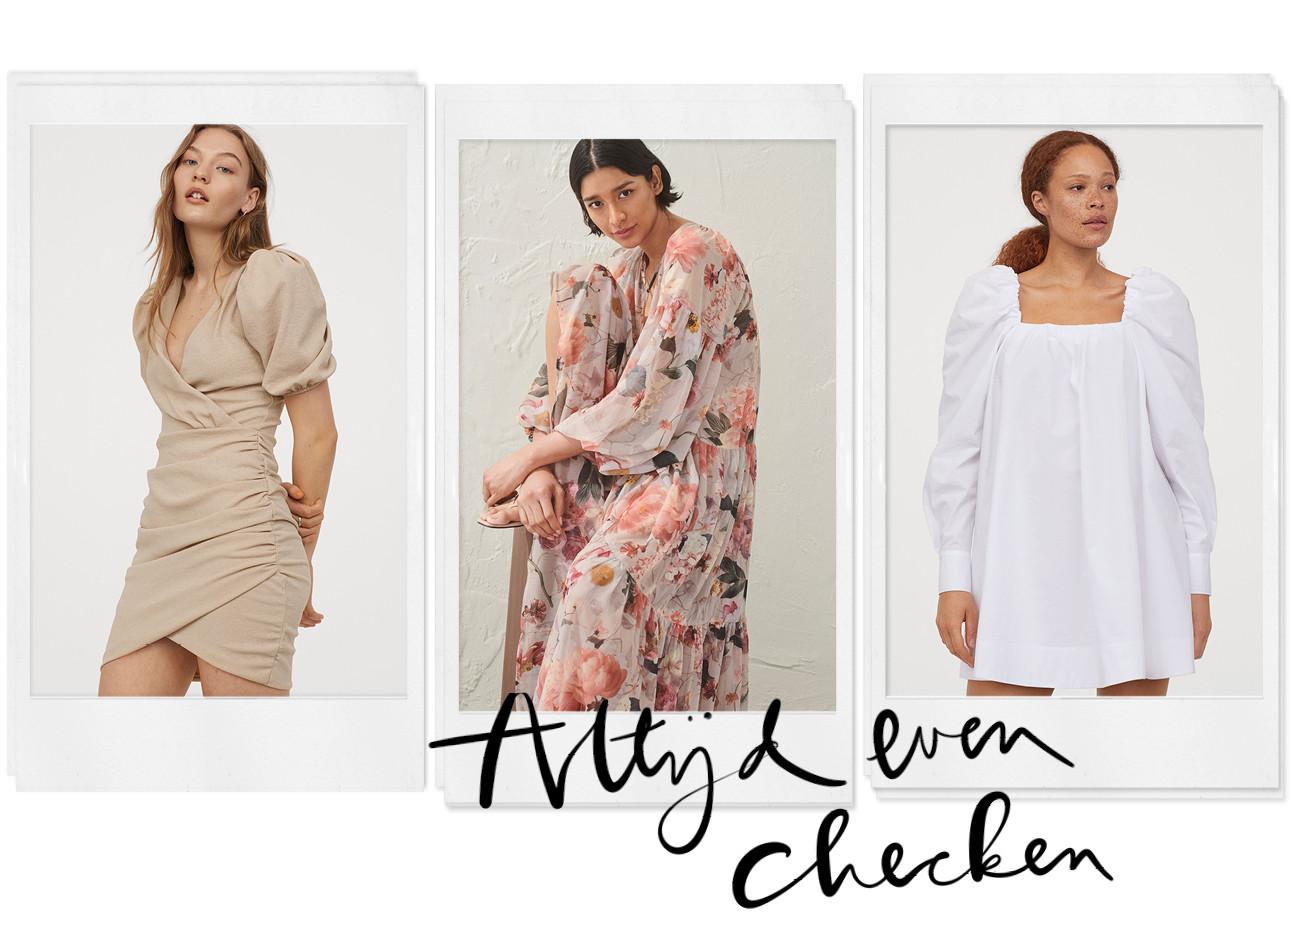 12x de leukste jurkjes uit de H&M summer sale